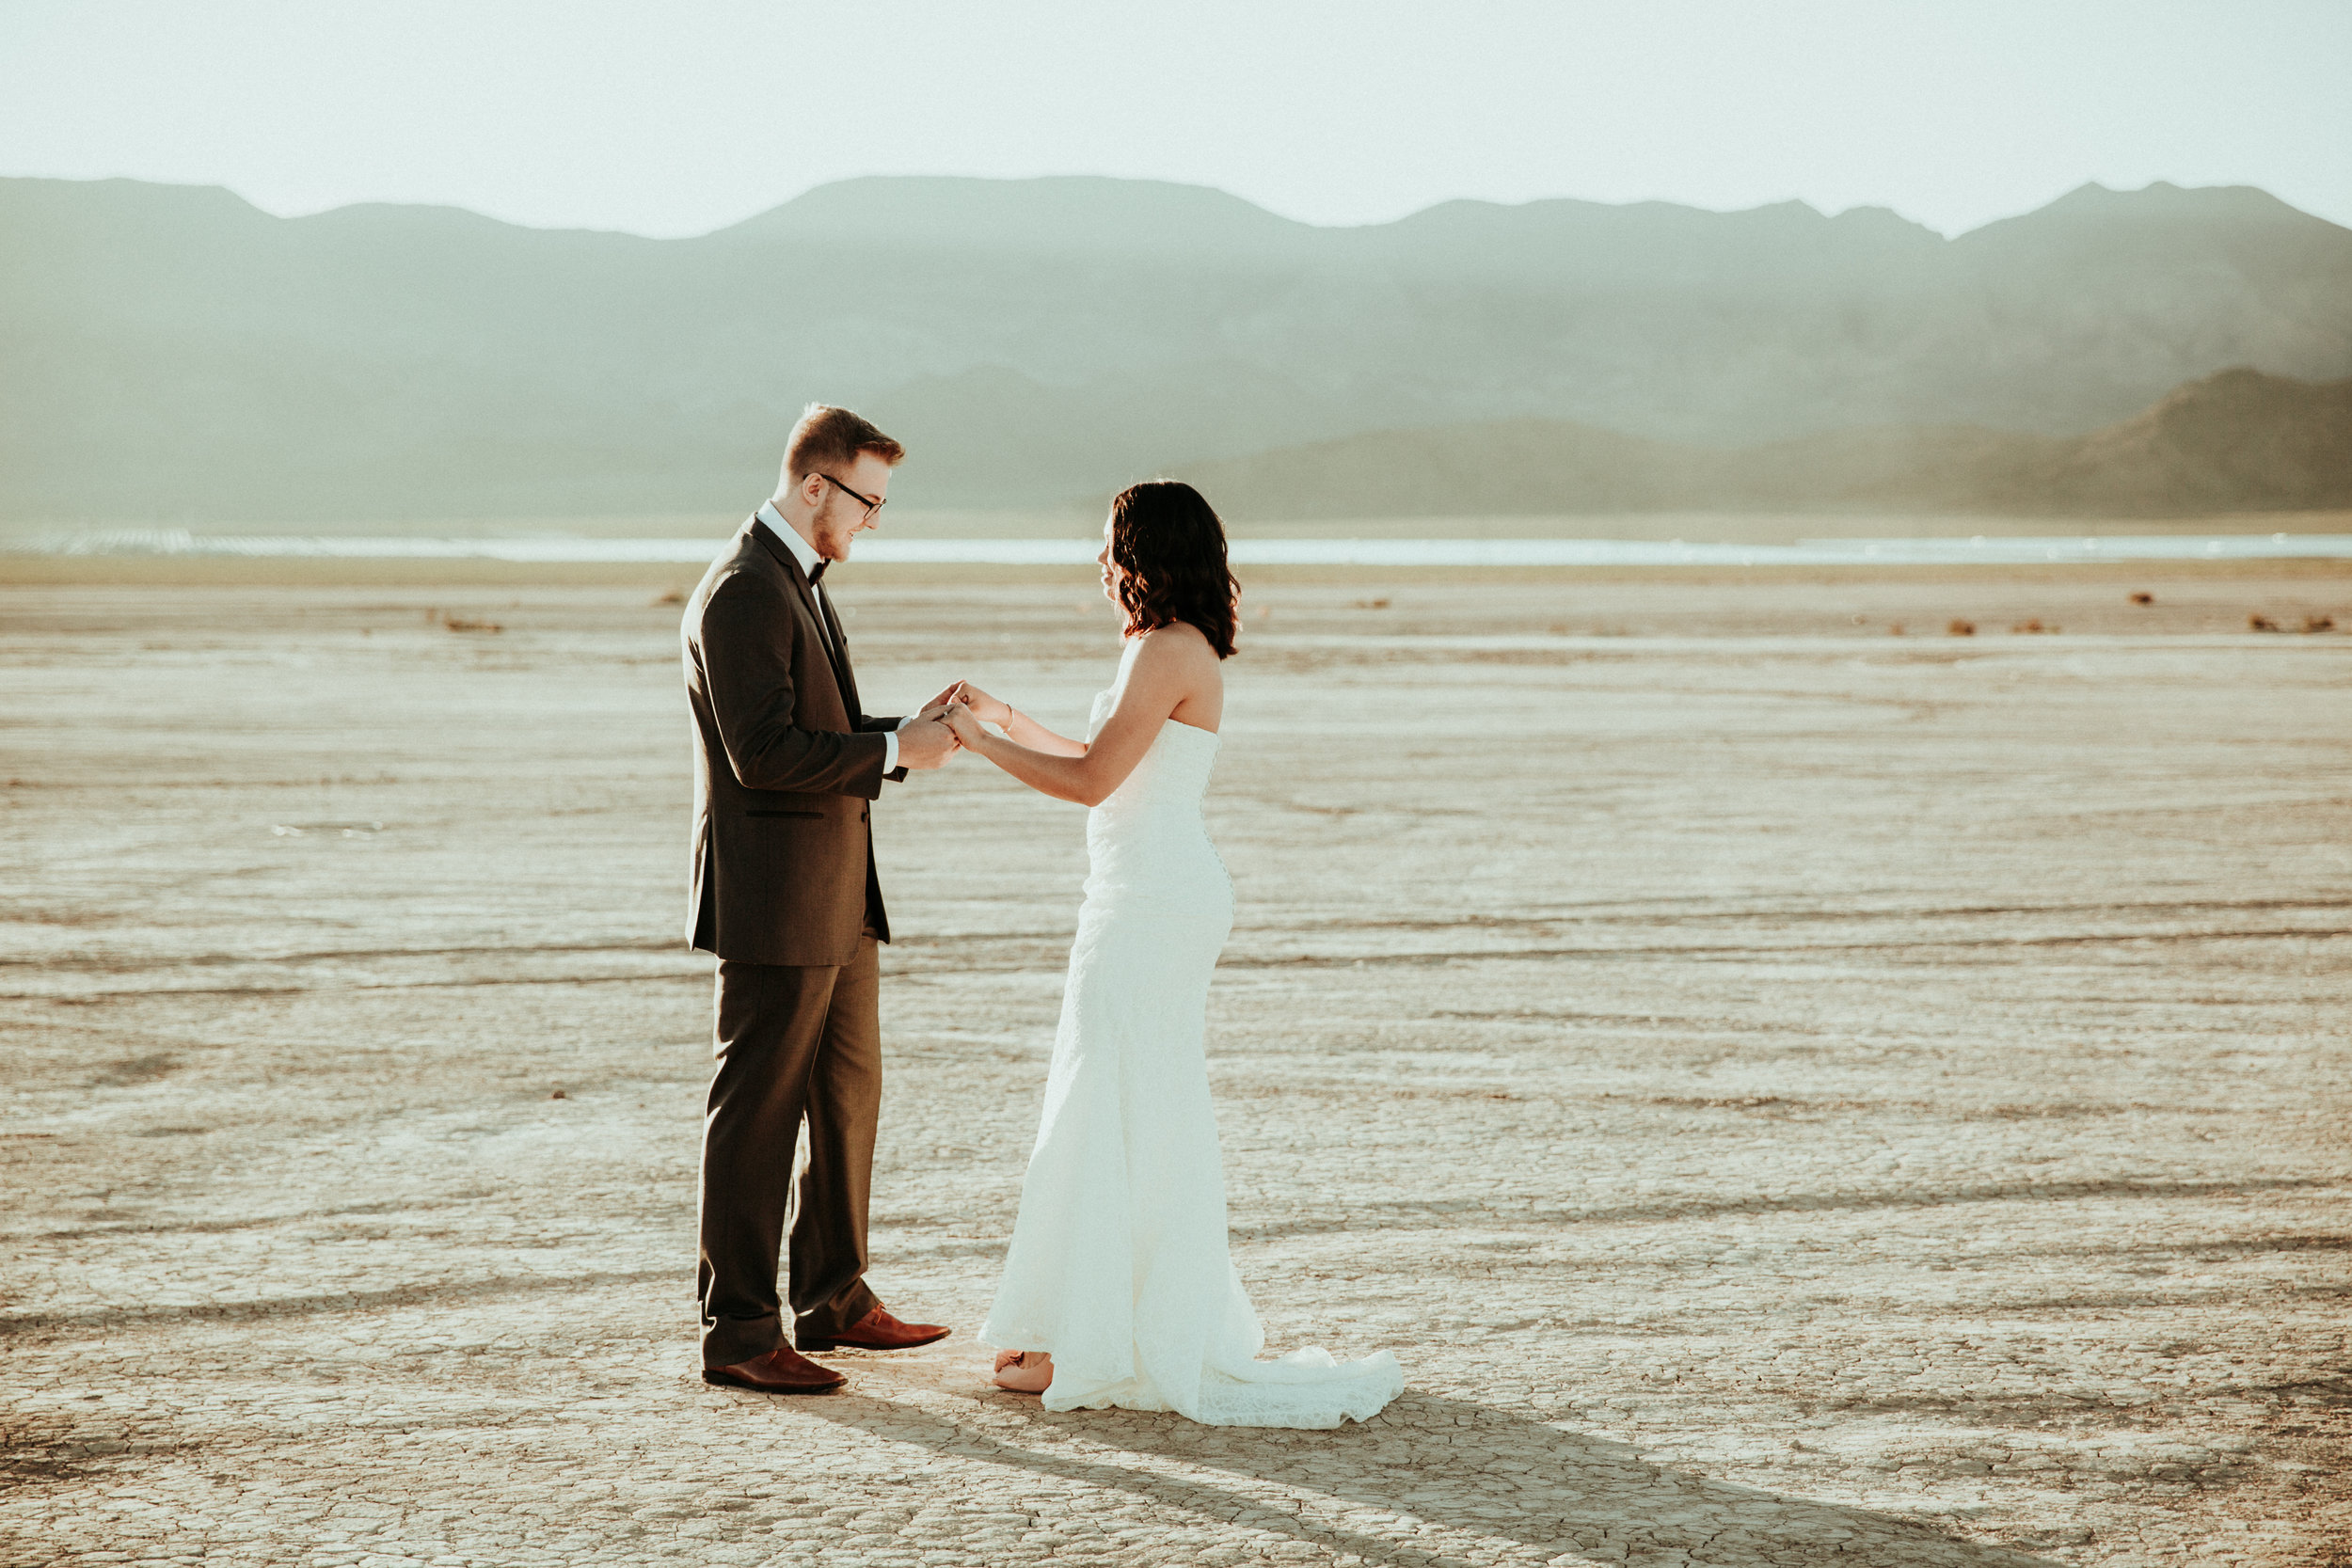 Las Vegas Wedding Photography - Seattle Wedding Photographer - Destination Wedding Photographer - Elopement Photographer - First Look